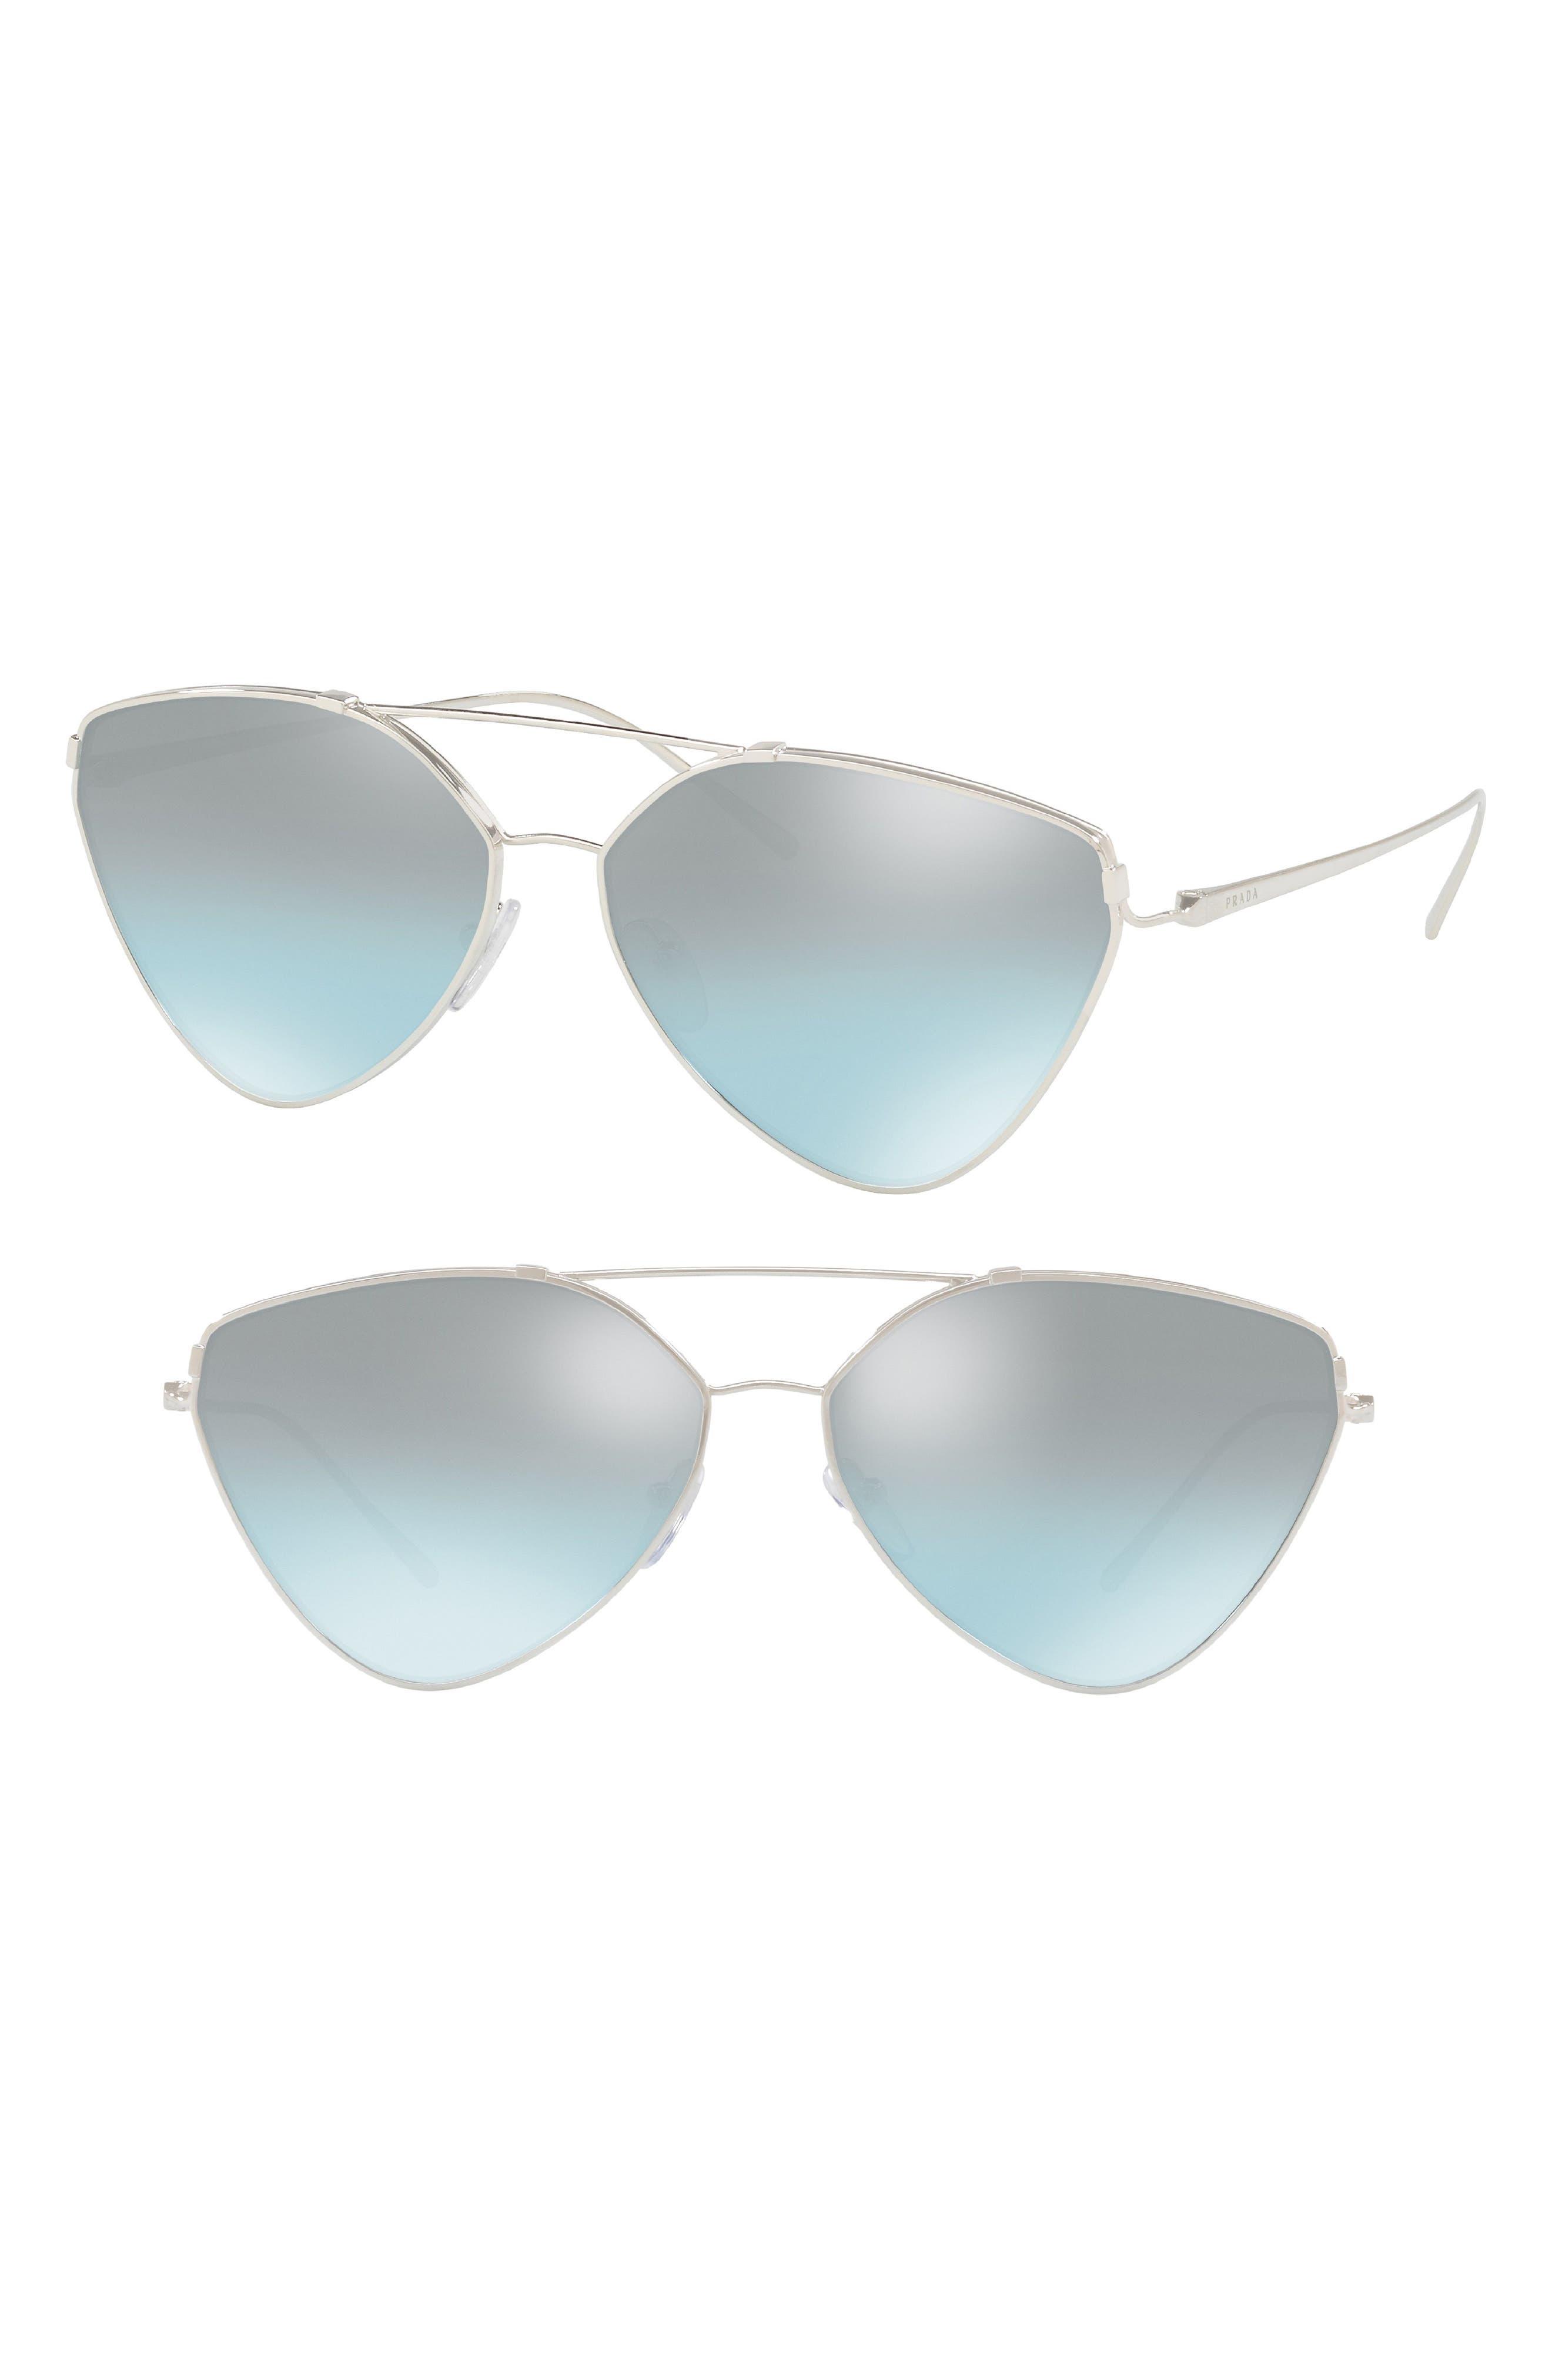 62mm Oversize Aviator Sunglasses,                             Alternate thumbnail 2, color,